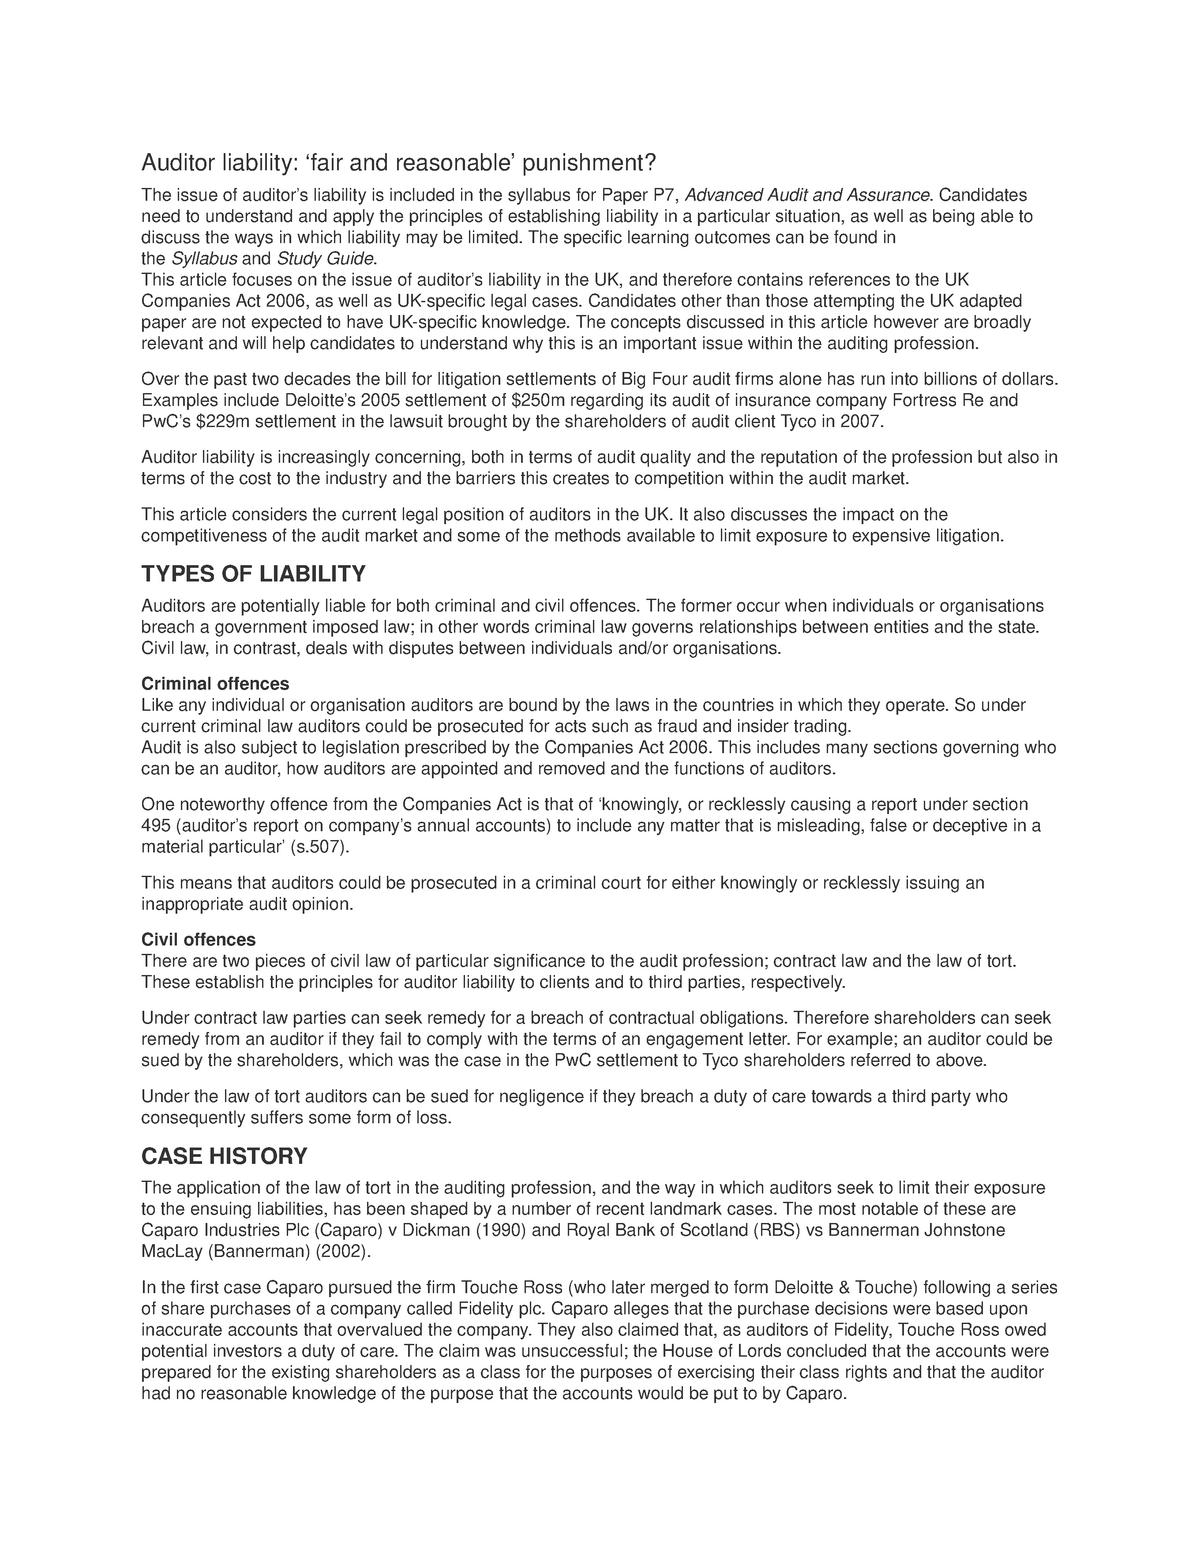 Auditor liability - audit - PSYC90008 - StuDocu